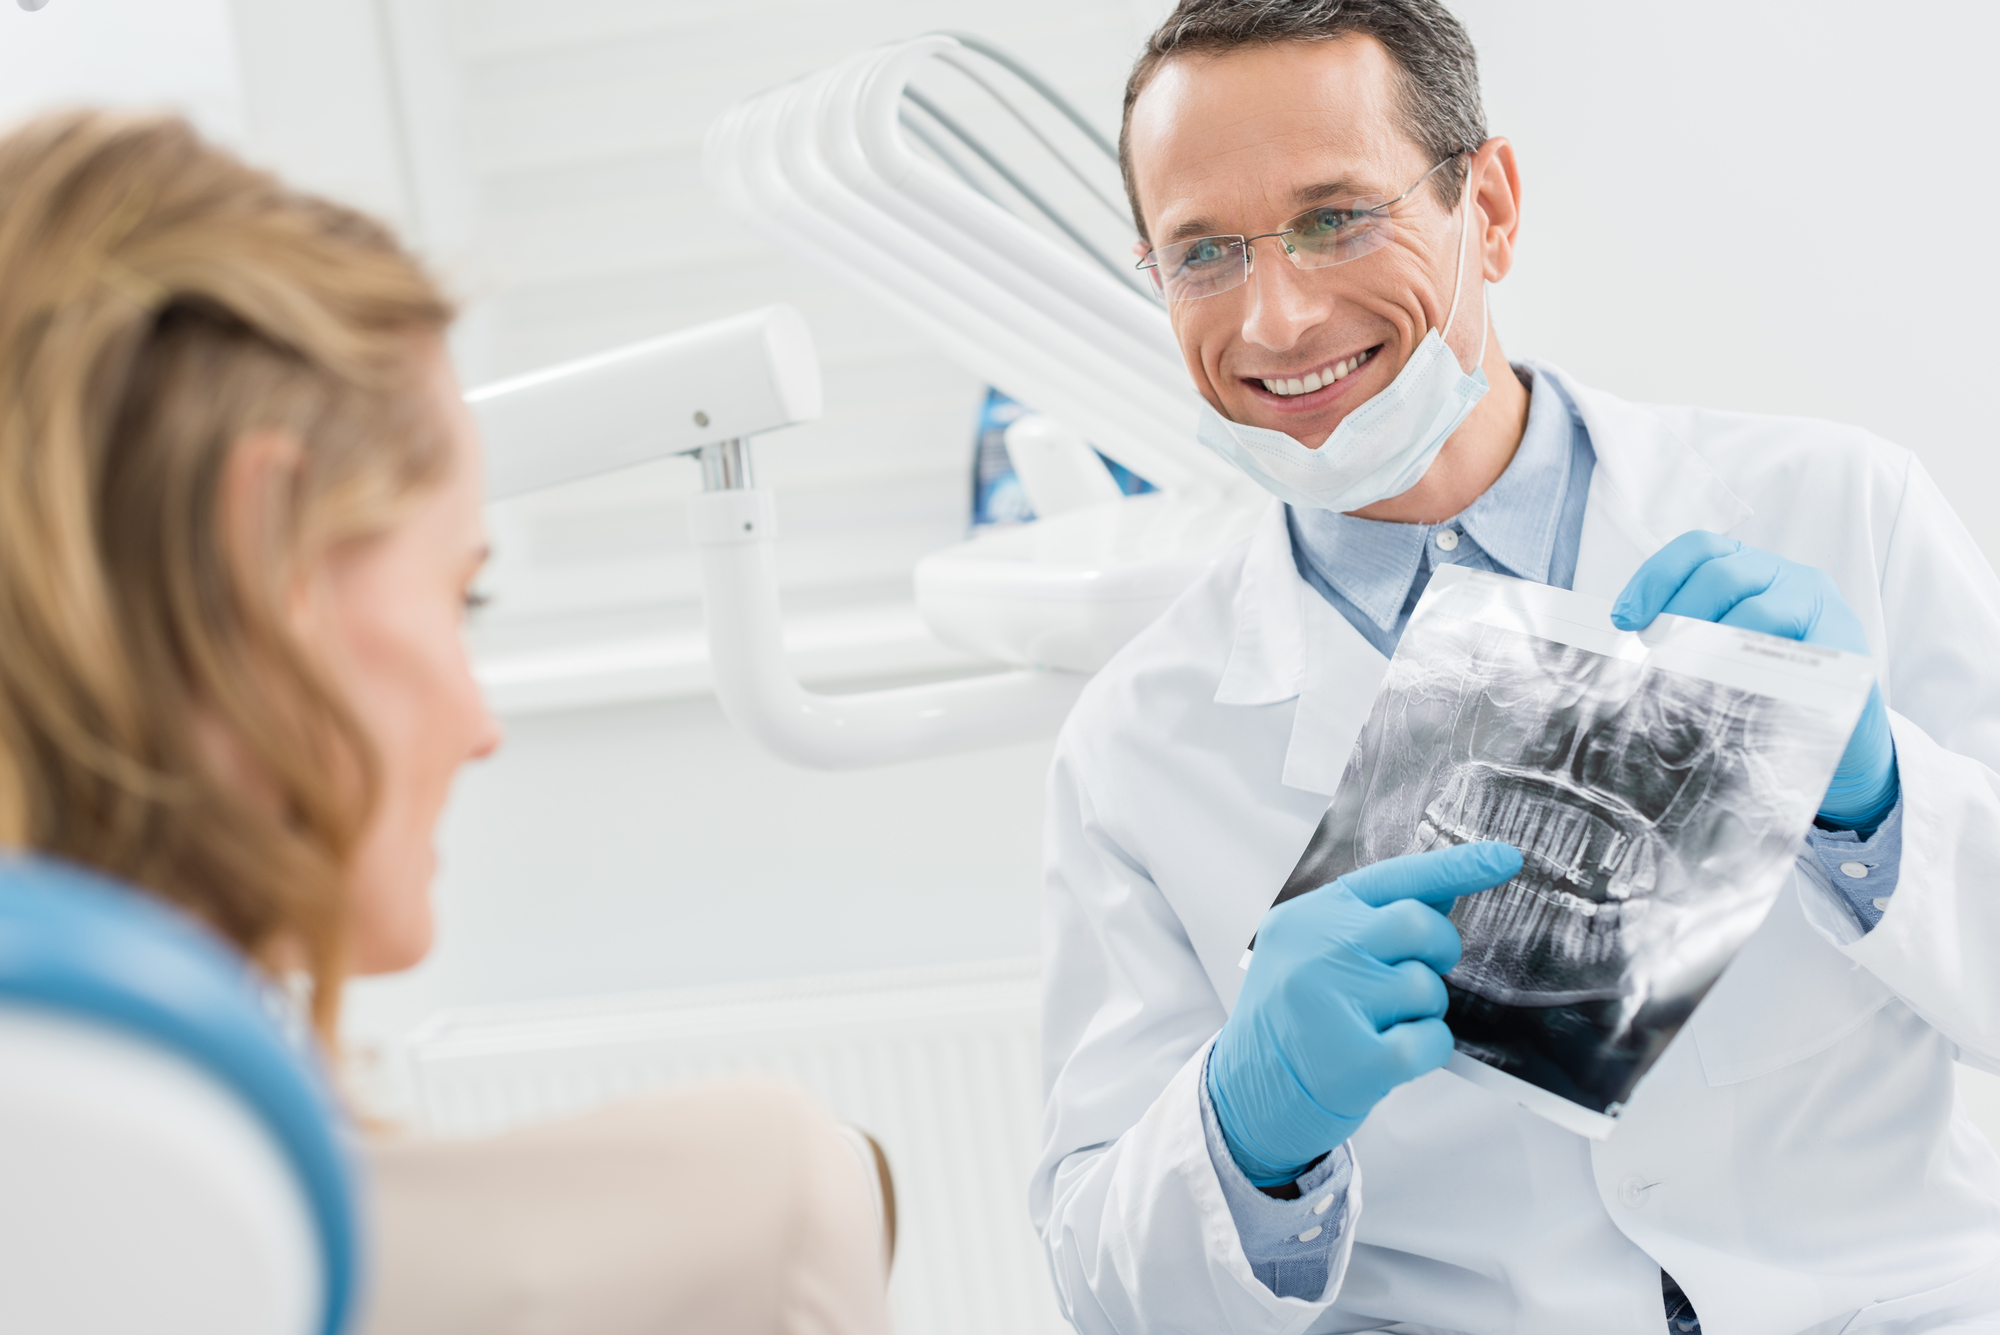 Dental-veneers-Bryan-County-GA